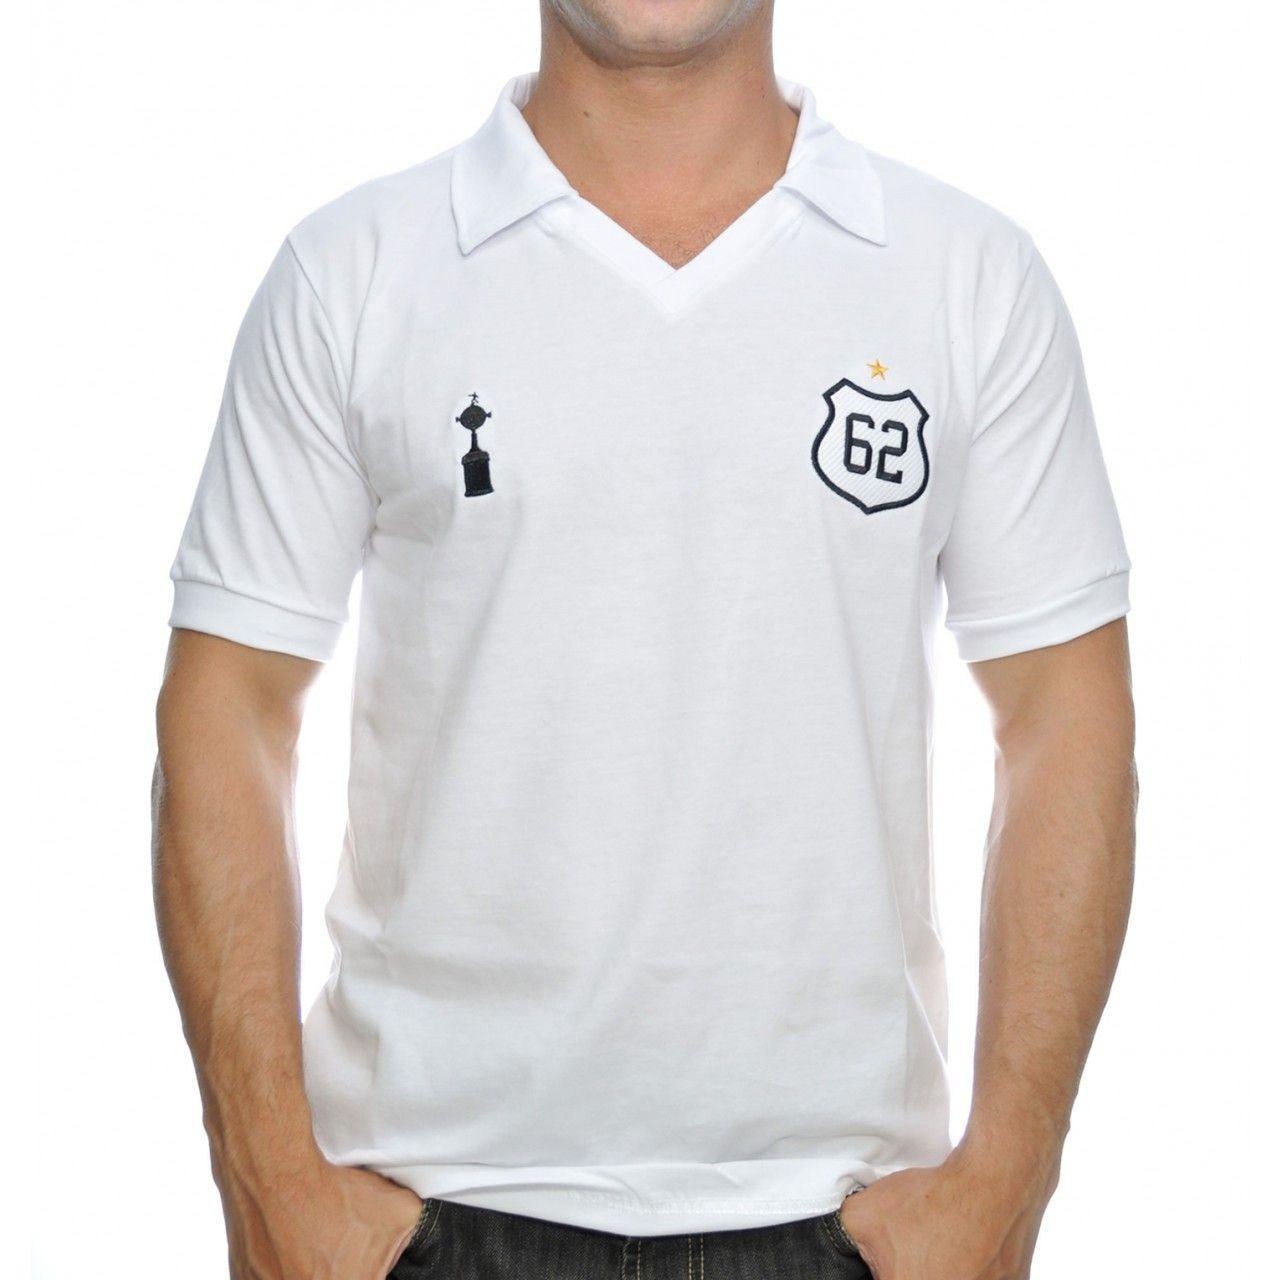 6365156af Camisa Retrô Santos 1962